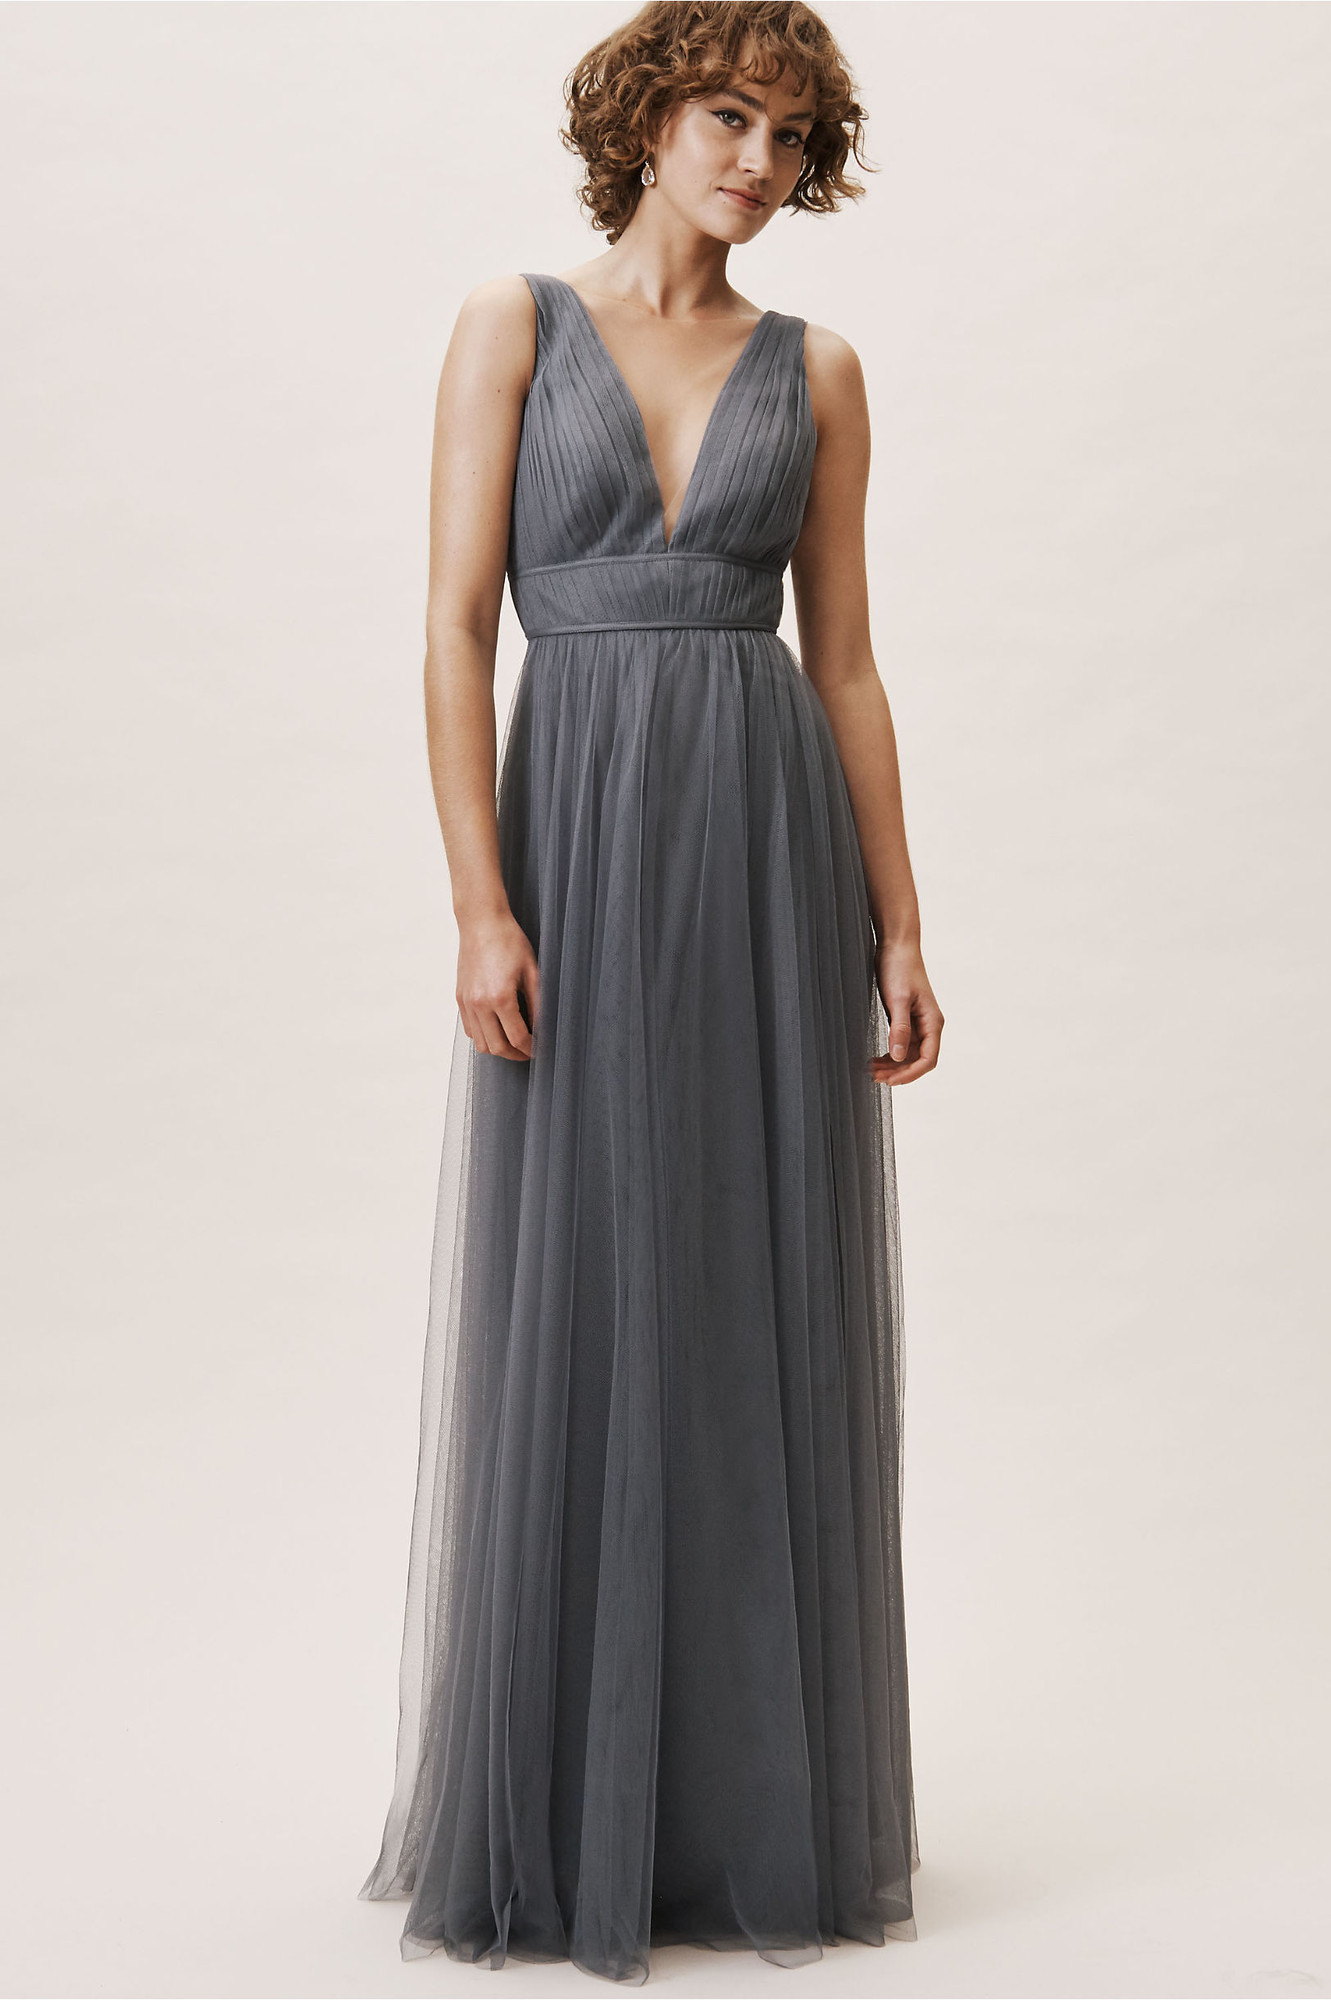 bf8df7a85d796 Sarita Dress - Hydrangea A-line Bridesmaid Dress by BHLDN ...